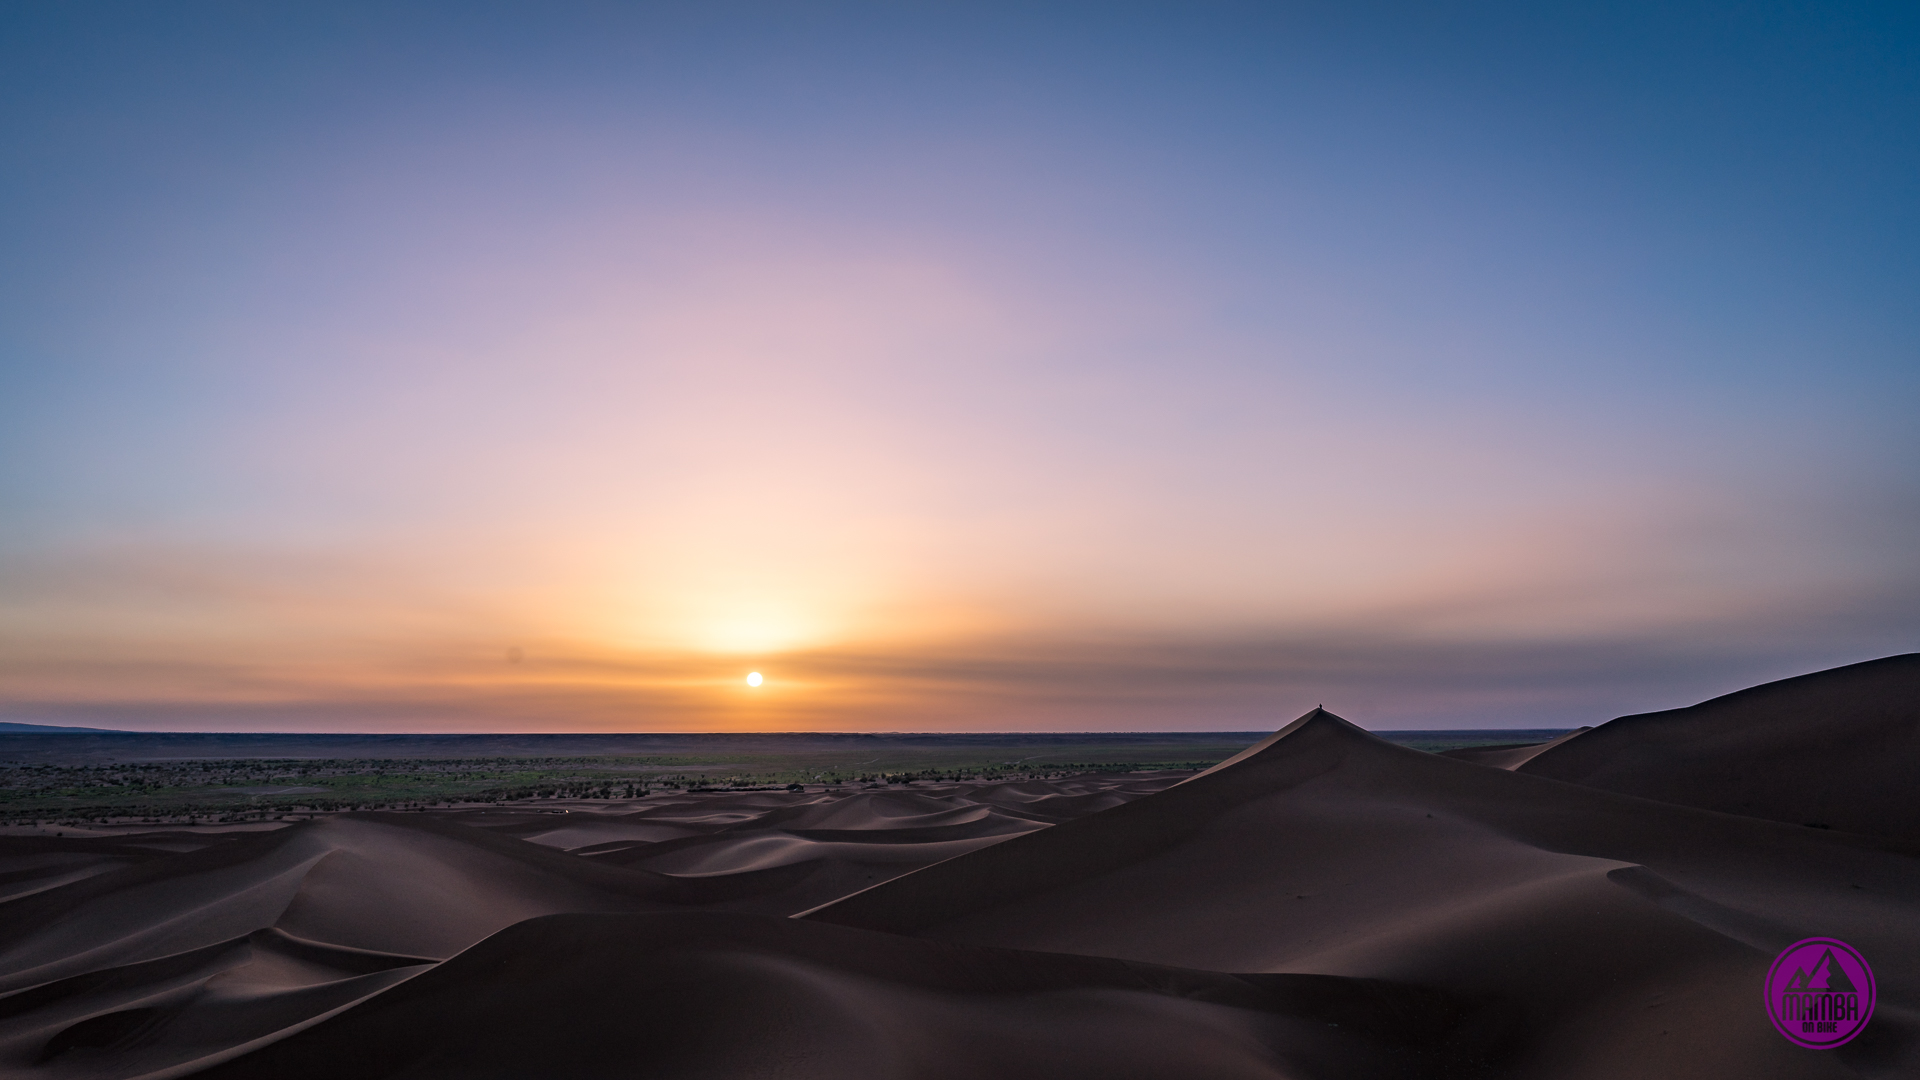 Poranek na pustyni